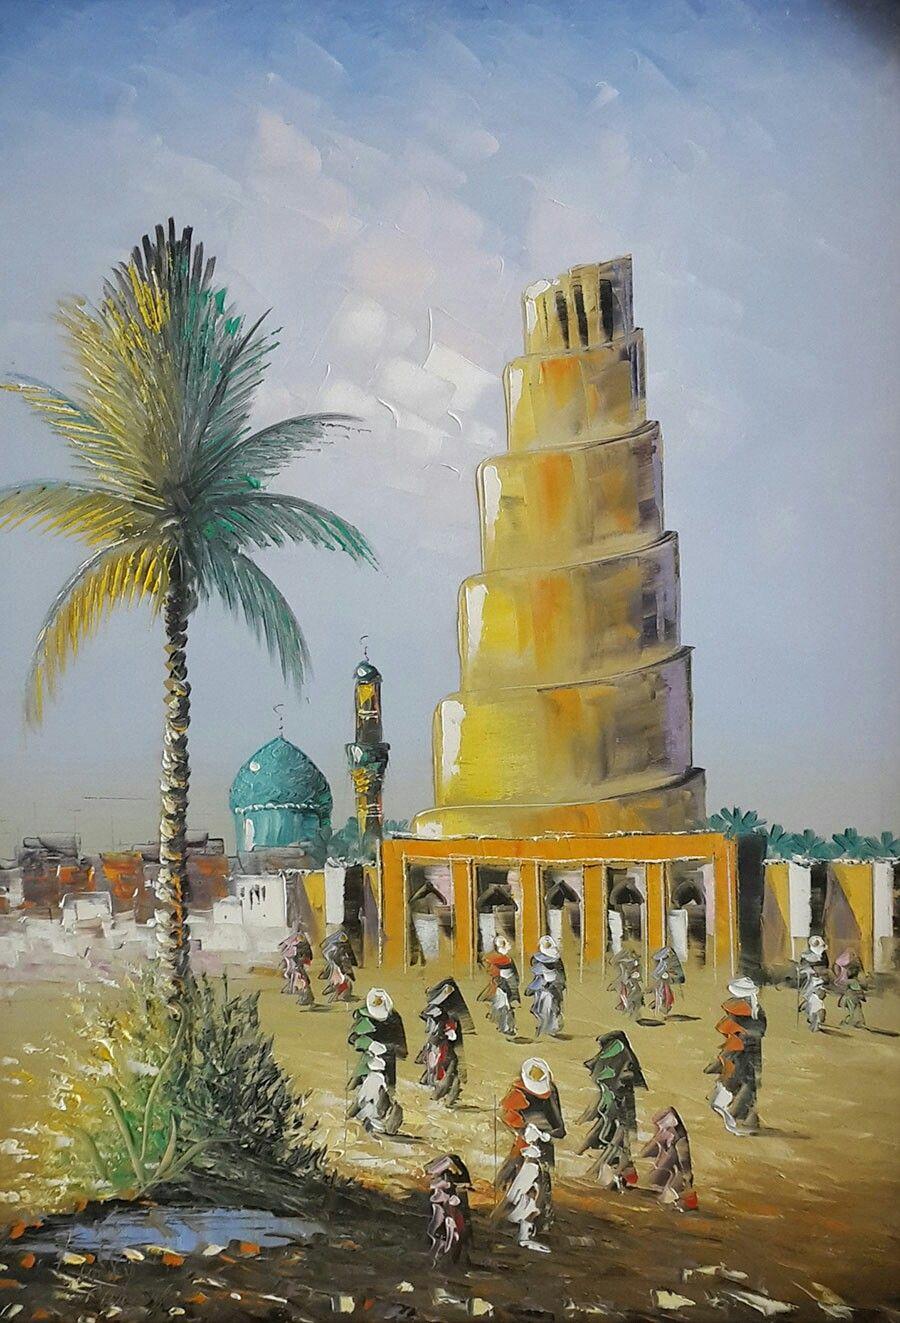 Pin By Adyan On منشوراتي المحفوظة Art Painting Arabian Art Islamic Art Calligraphy